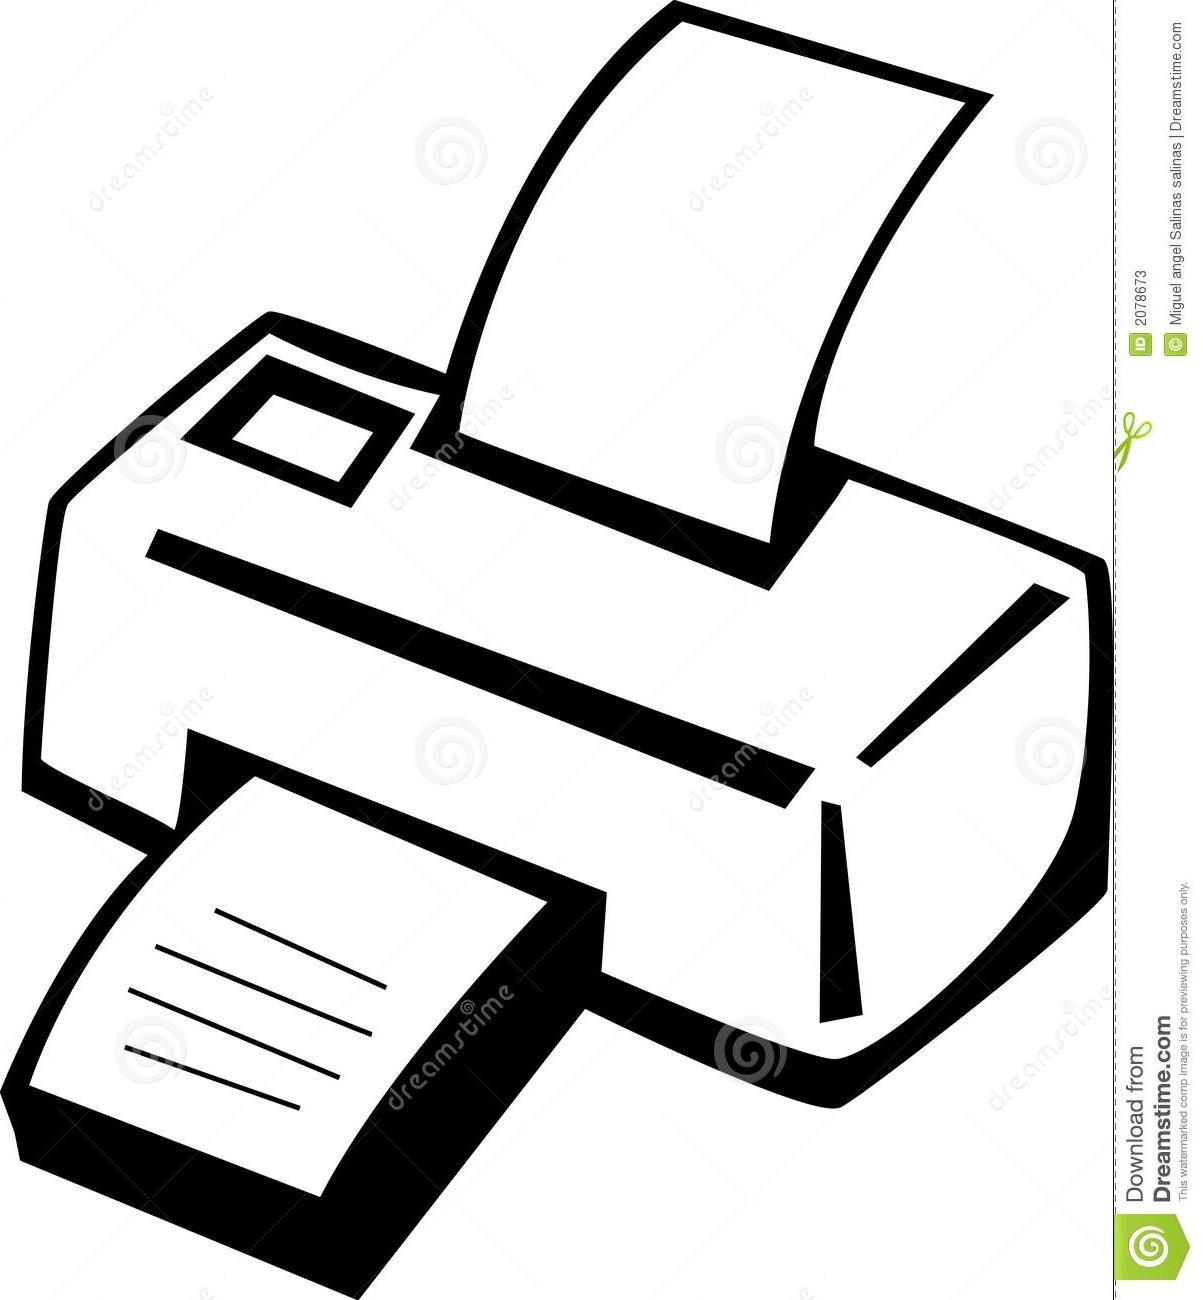 1203x1300 Unique Machine Vector Fax Clipart Design